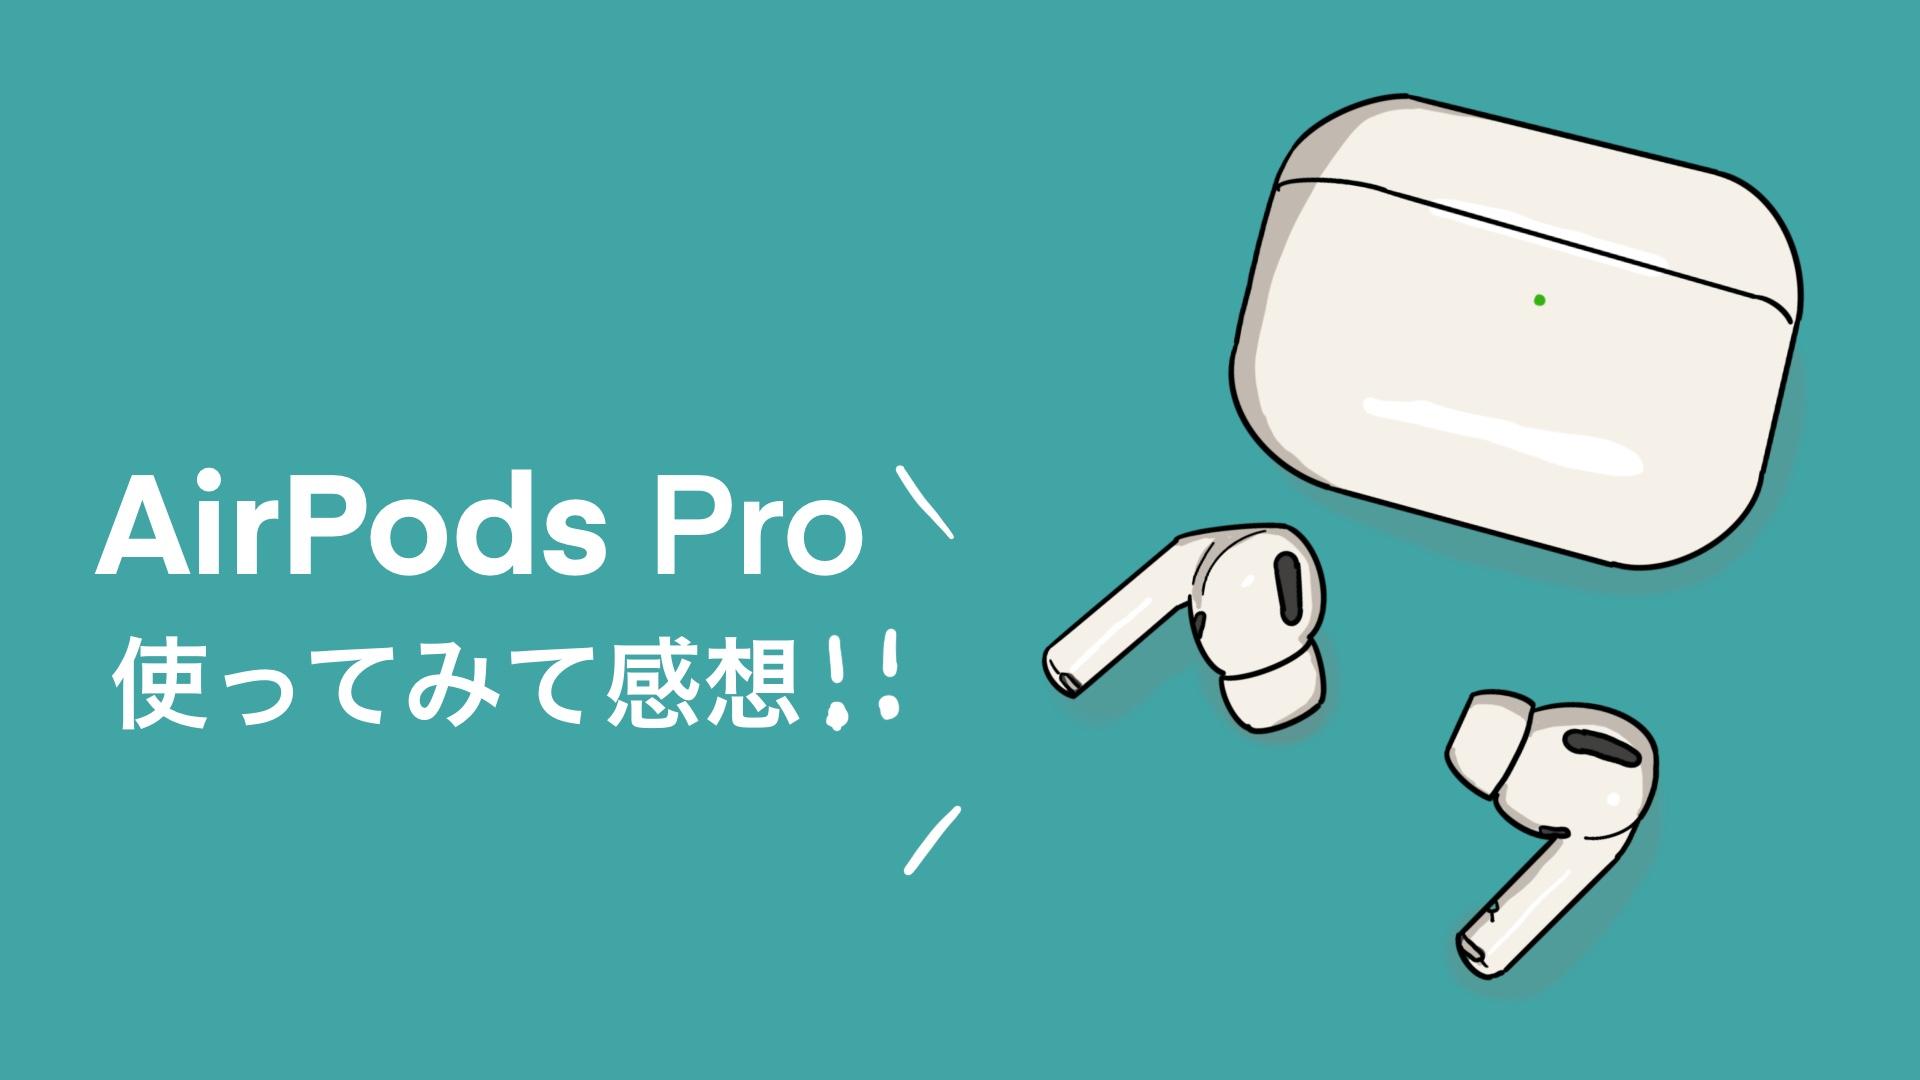 AirPods Pro、使ってみて感想